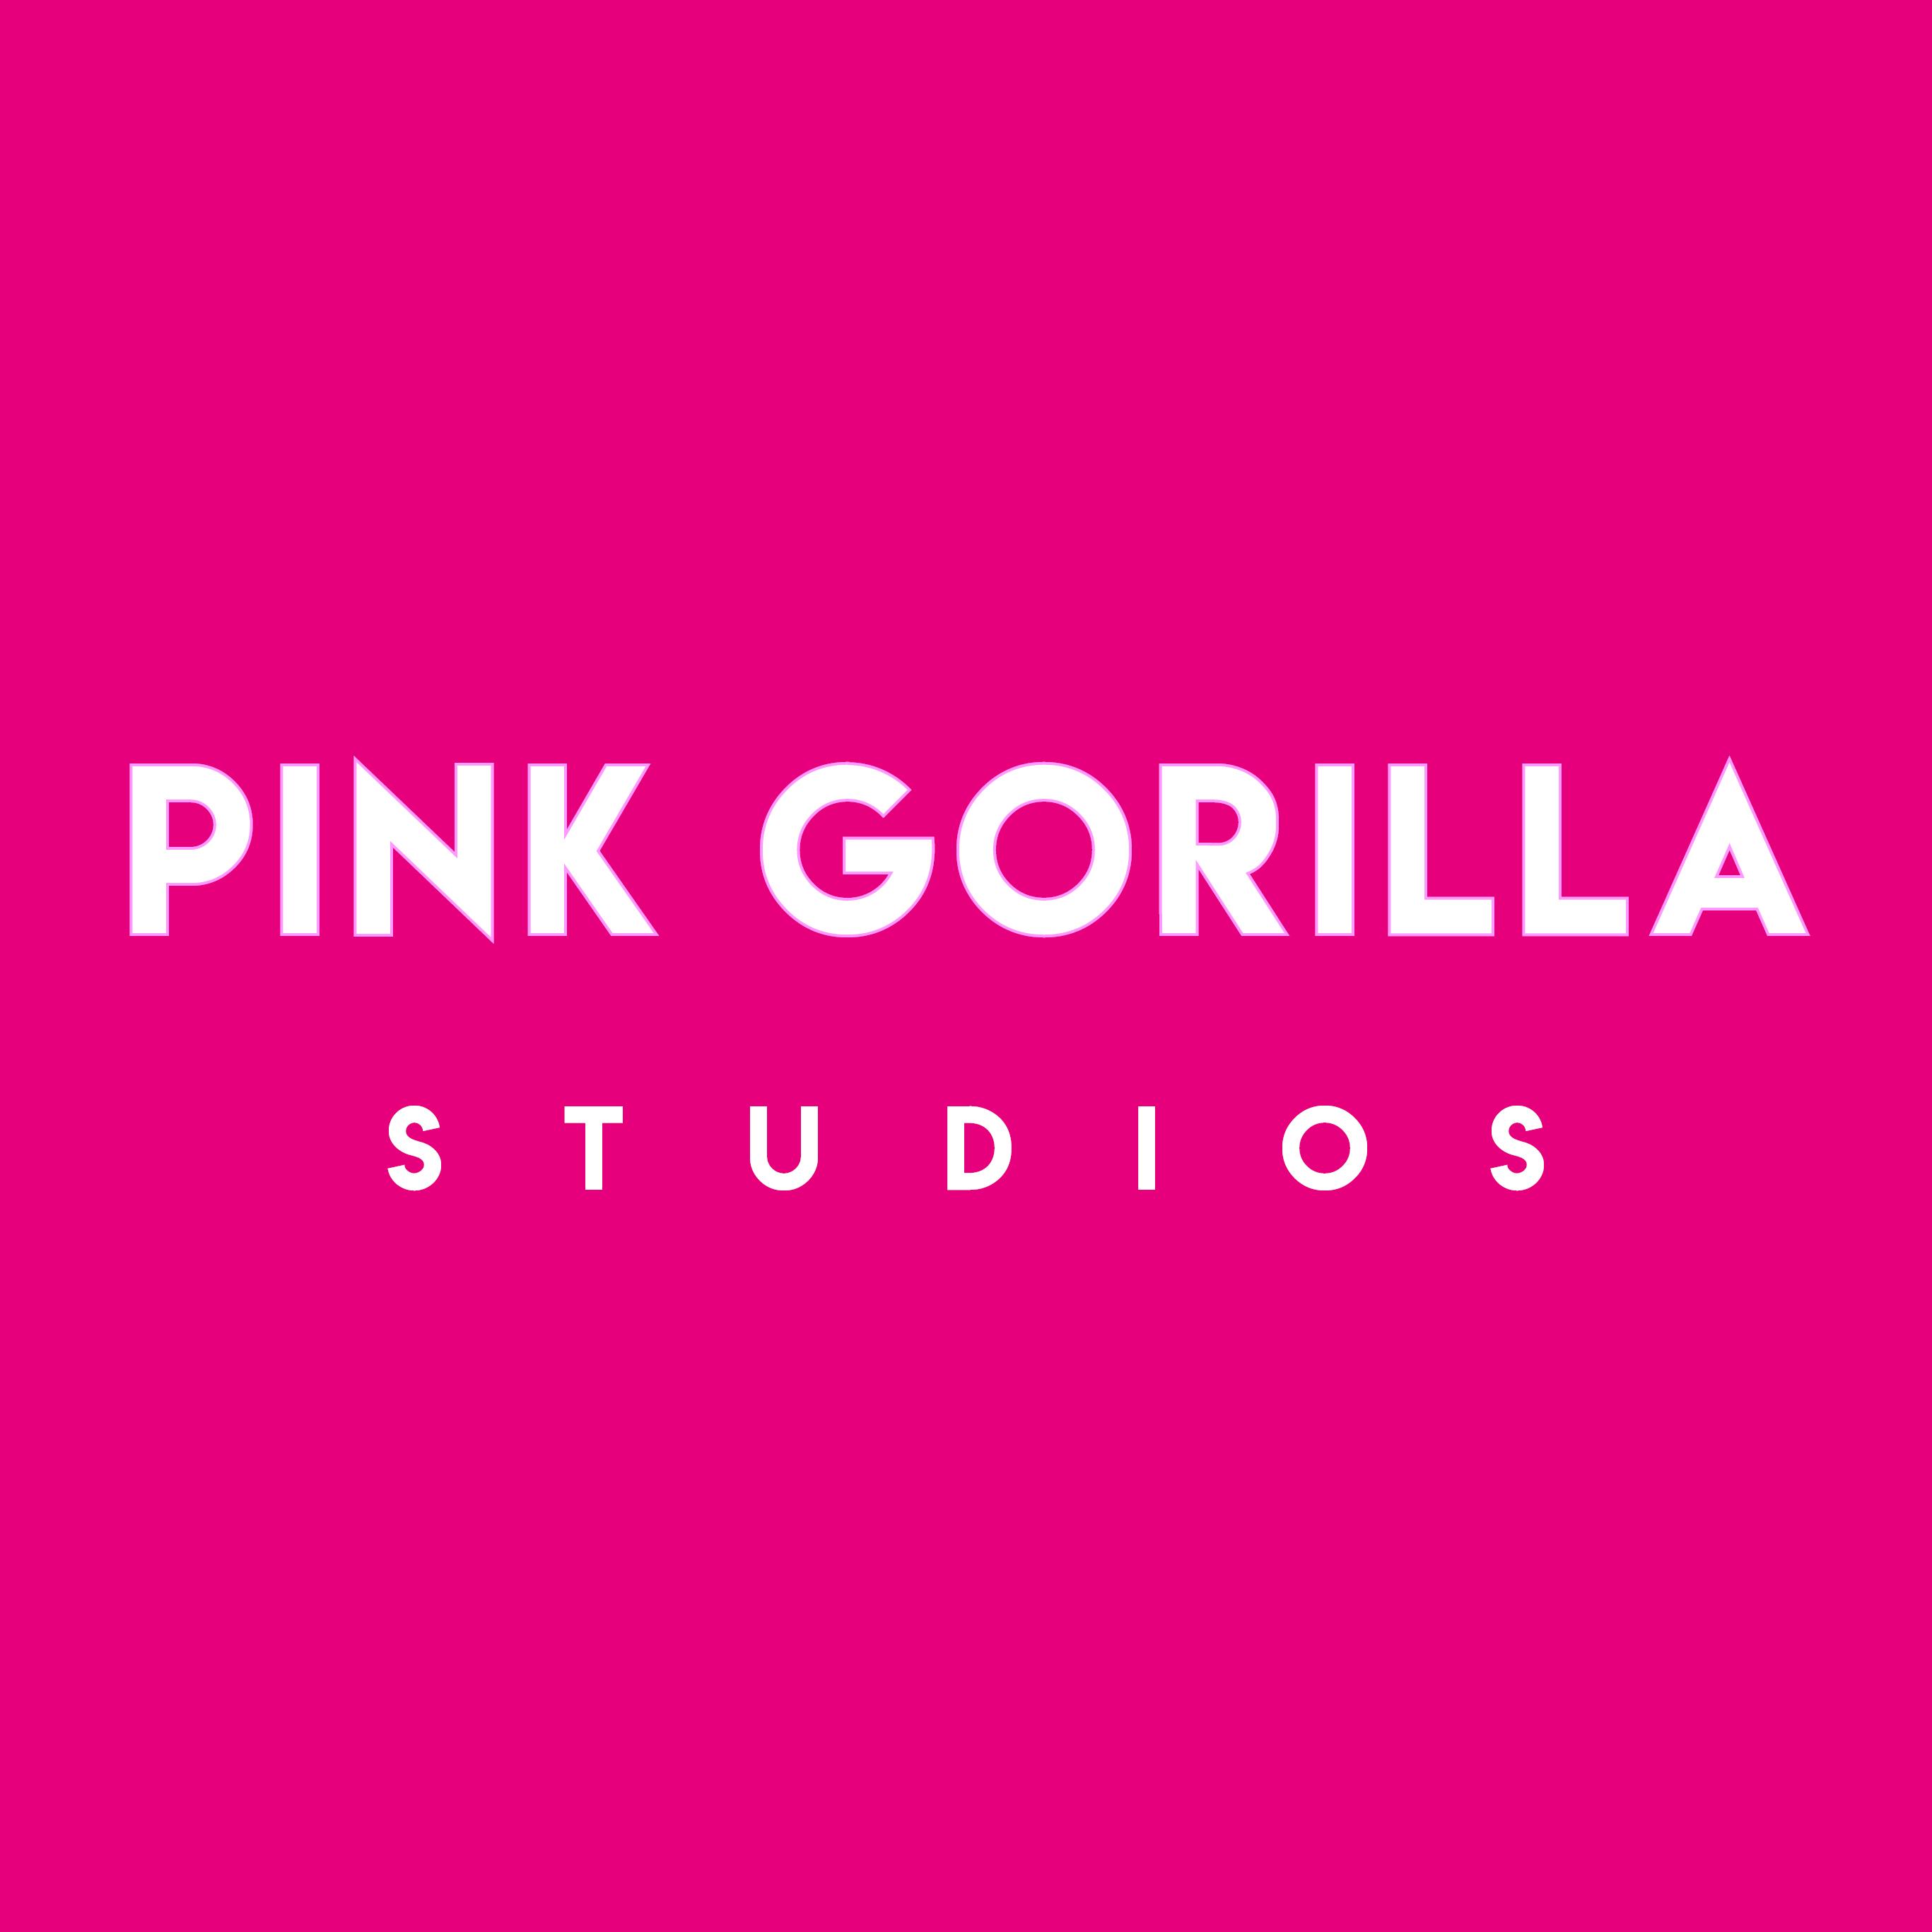 Pink Gorilla Studios